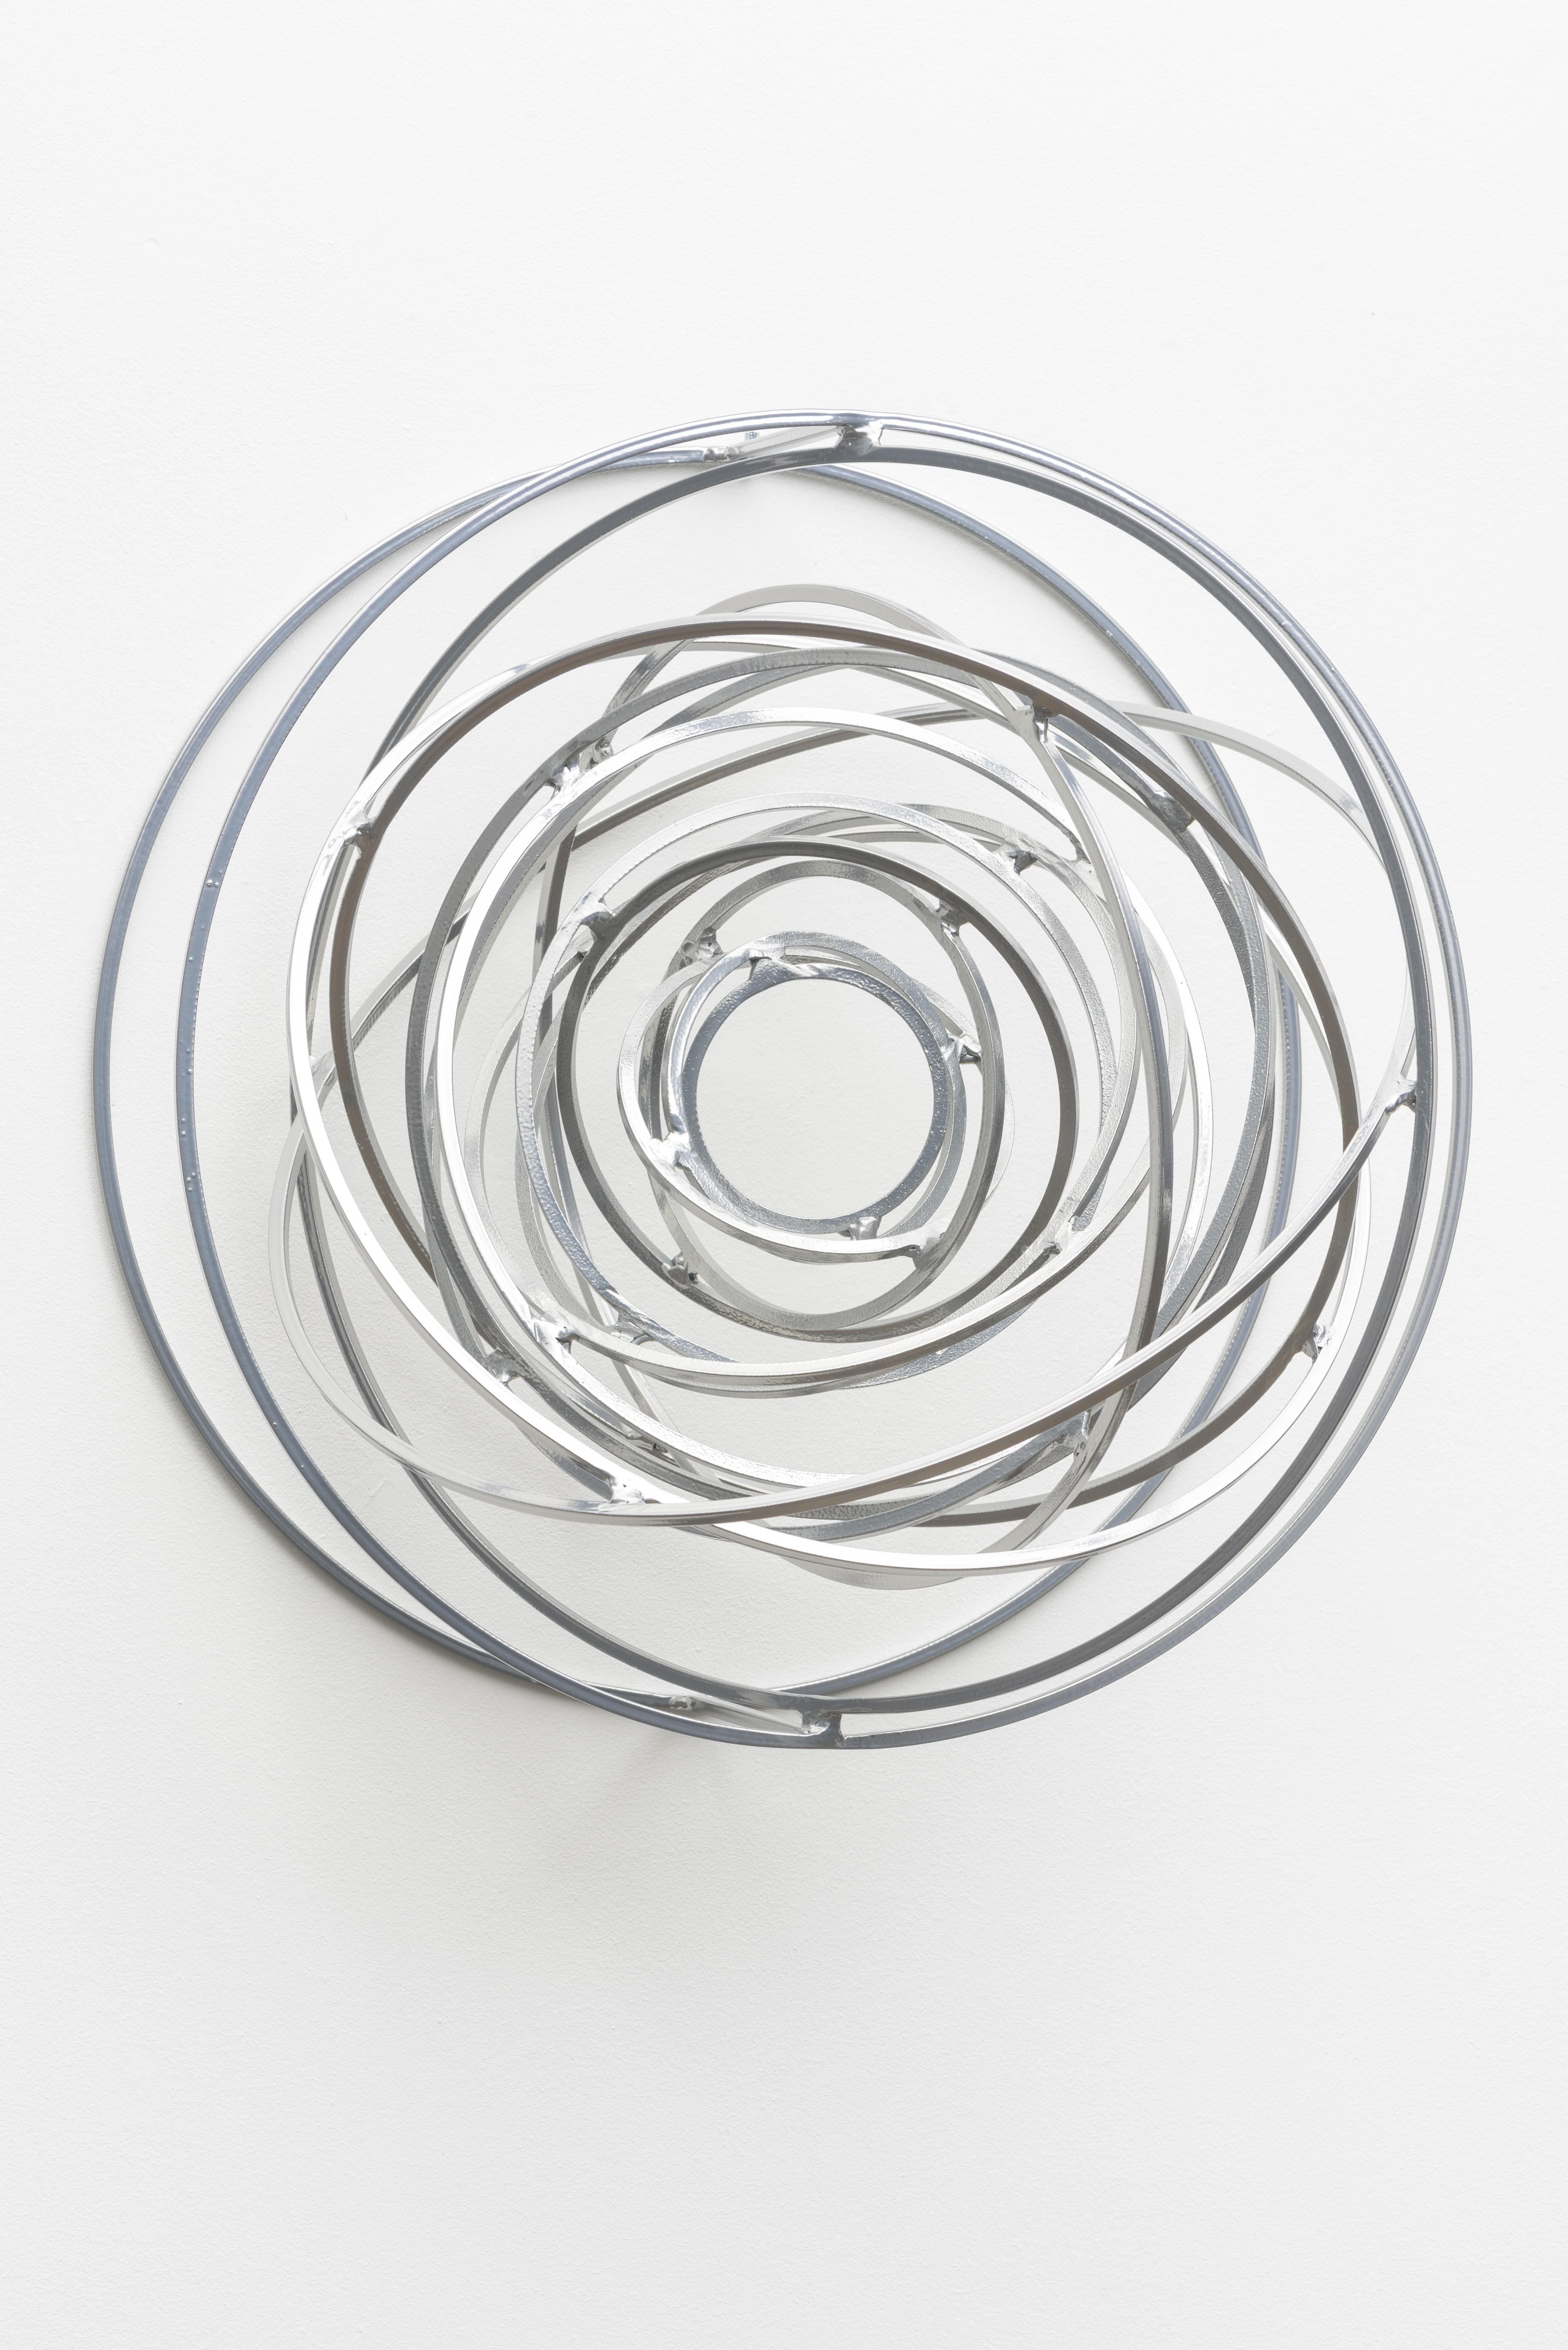 Michael Jacklin, Oculus